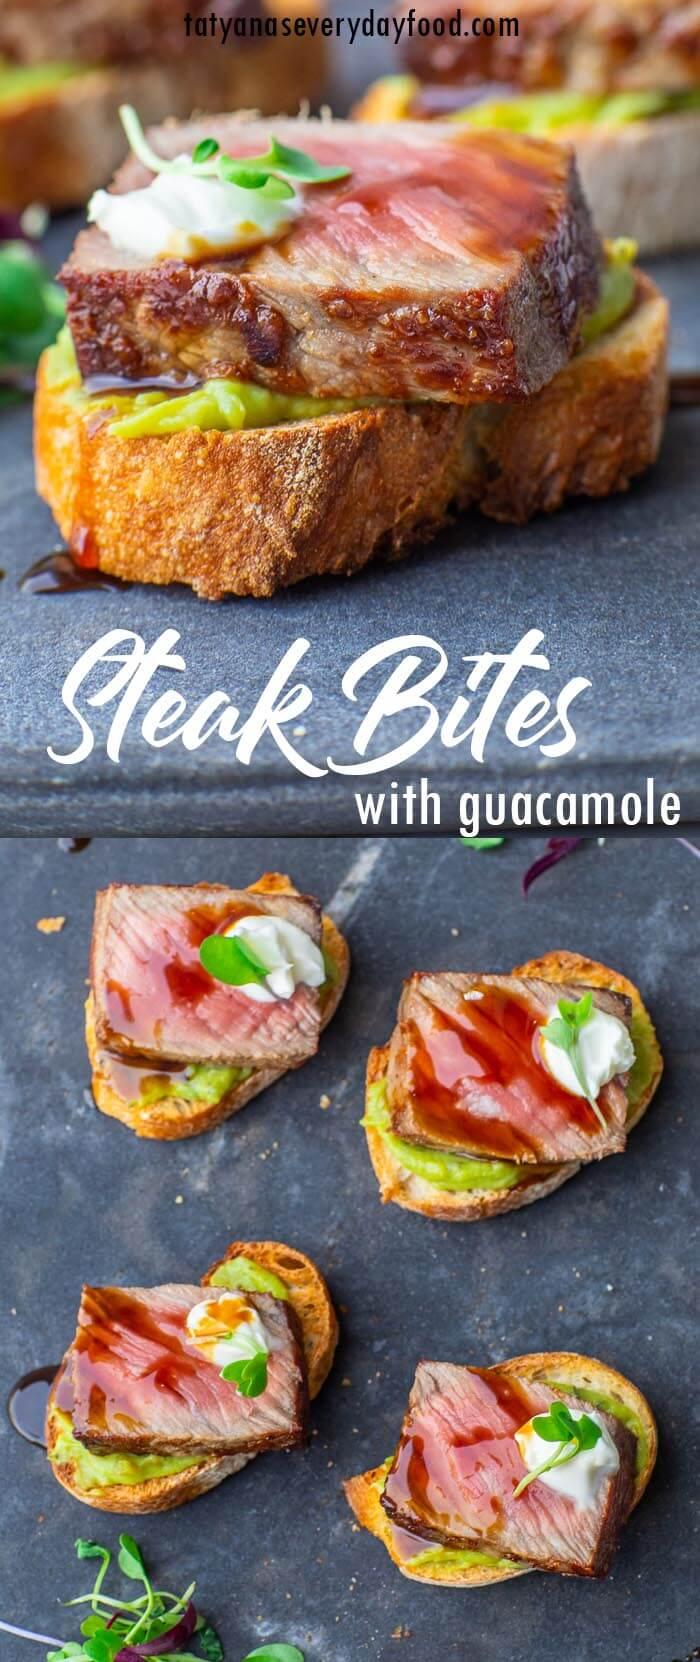 Steak Bites with Guacamole Recipe